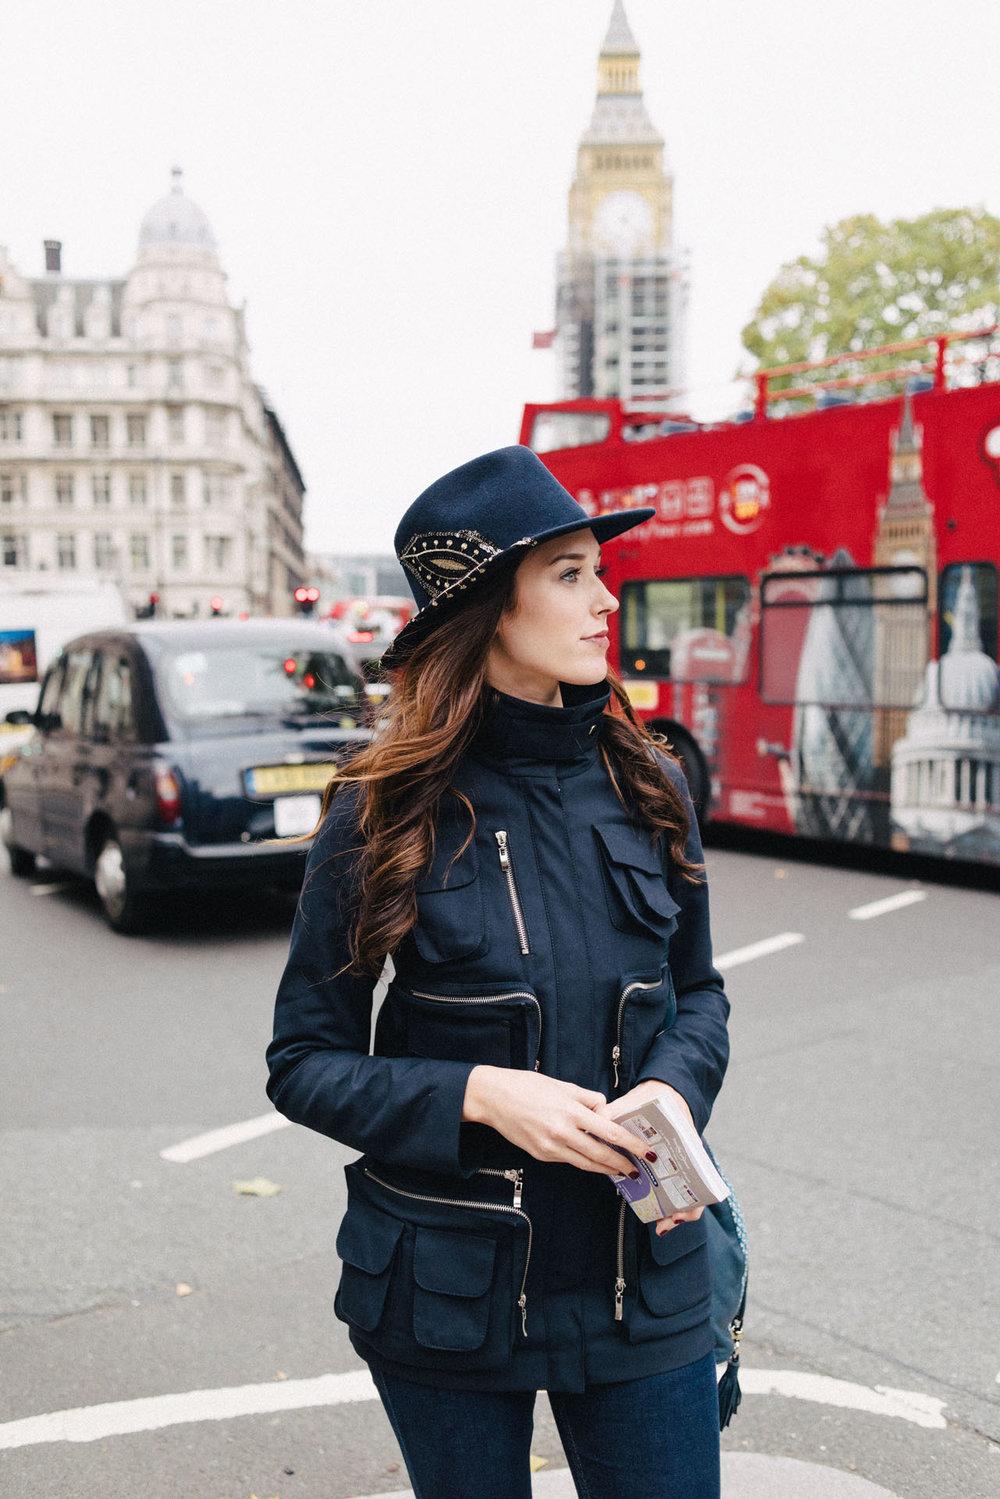 Sprazzi_Professional_Portrait_Photo_London_Olga_Original_25.jpg